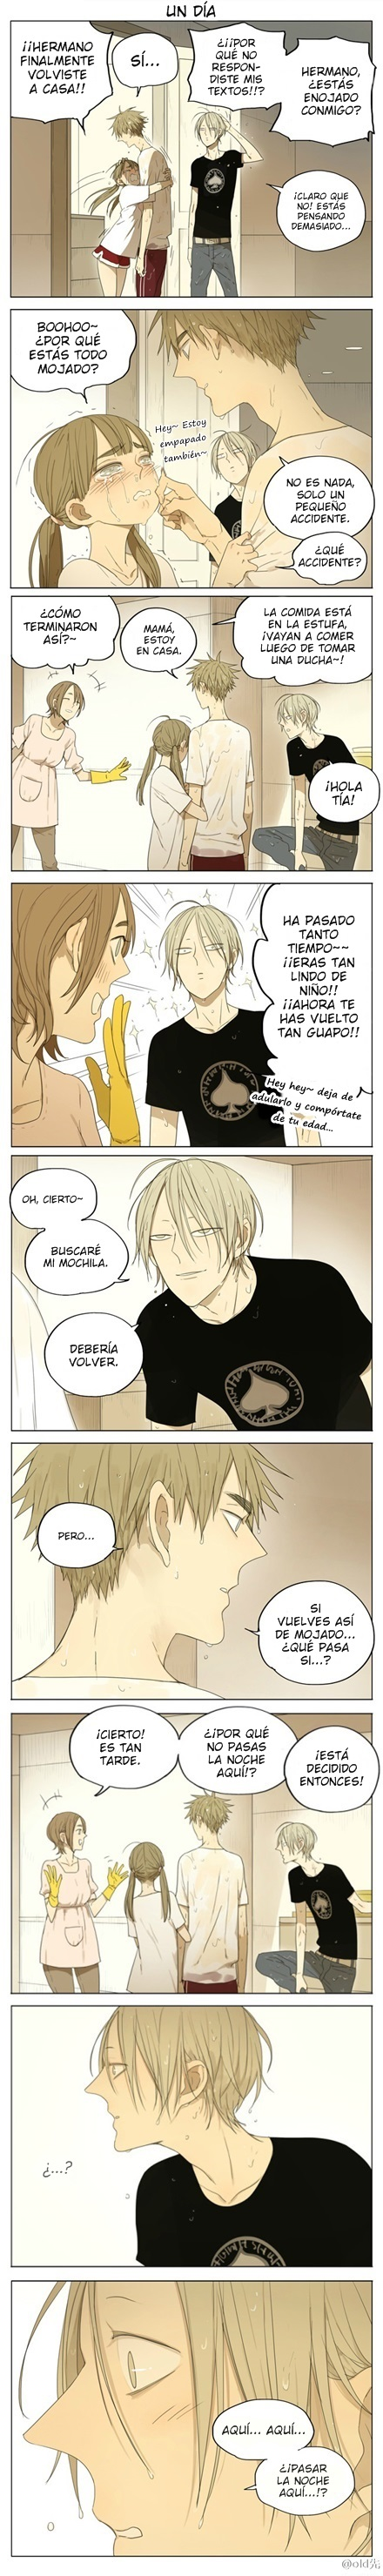 https://c5.ninemanga.com/es_manga/7/15943/381023/21b29648a47a45ad16bb0da0c004dfba.jpg Page 9